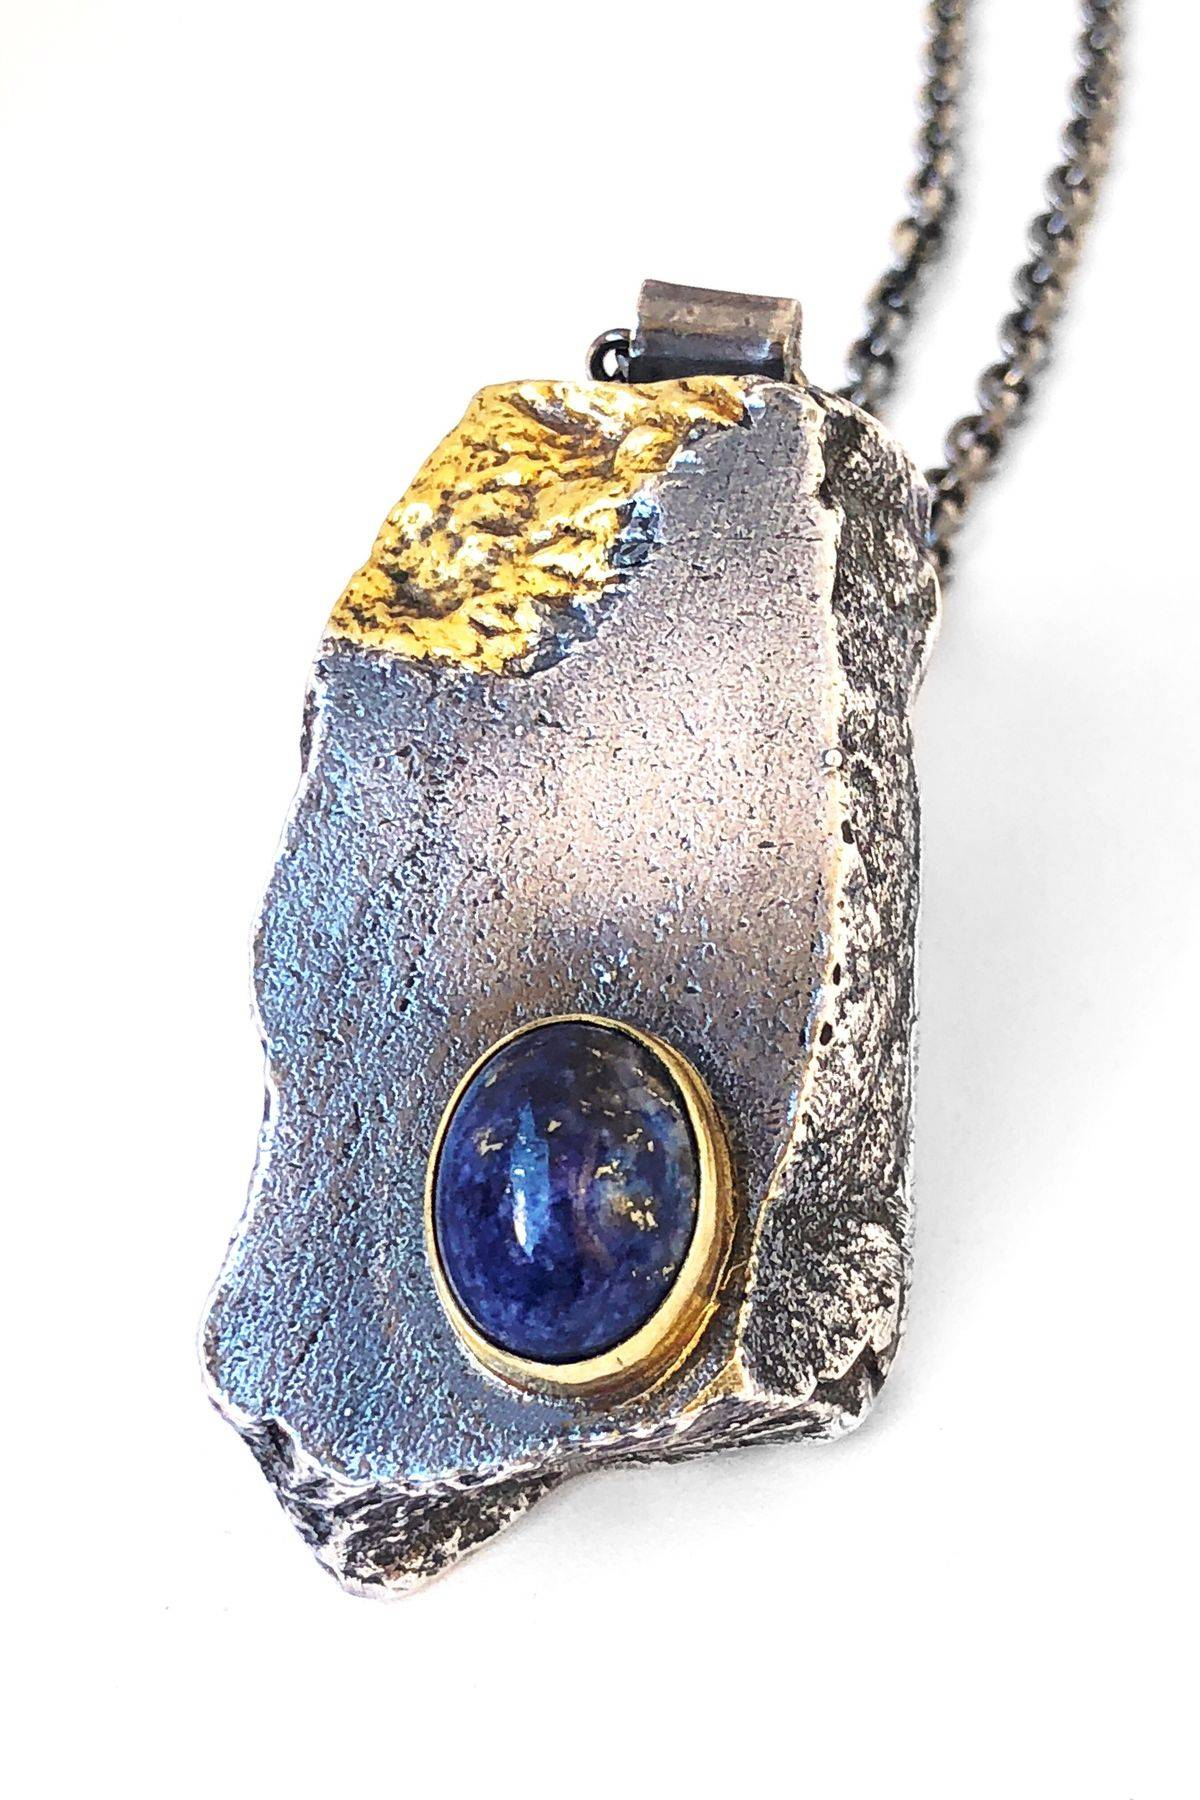 Art deco jewelry-830773462489978995